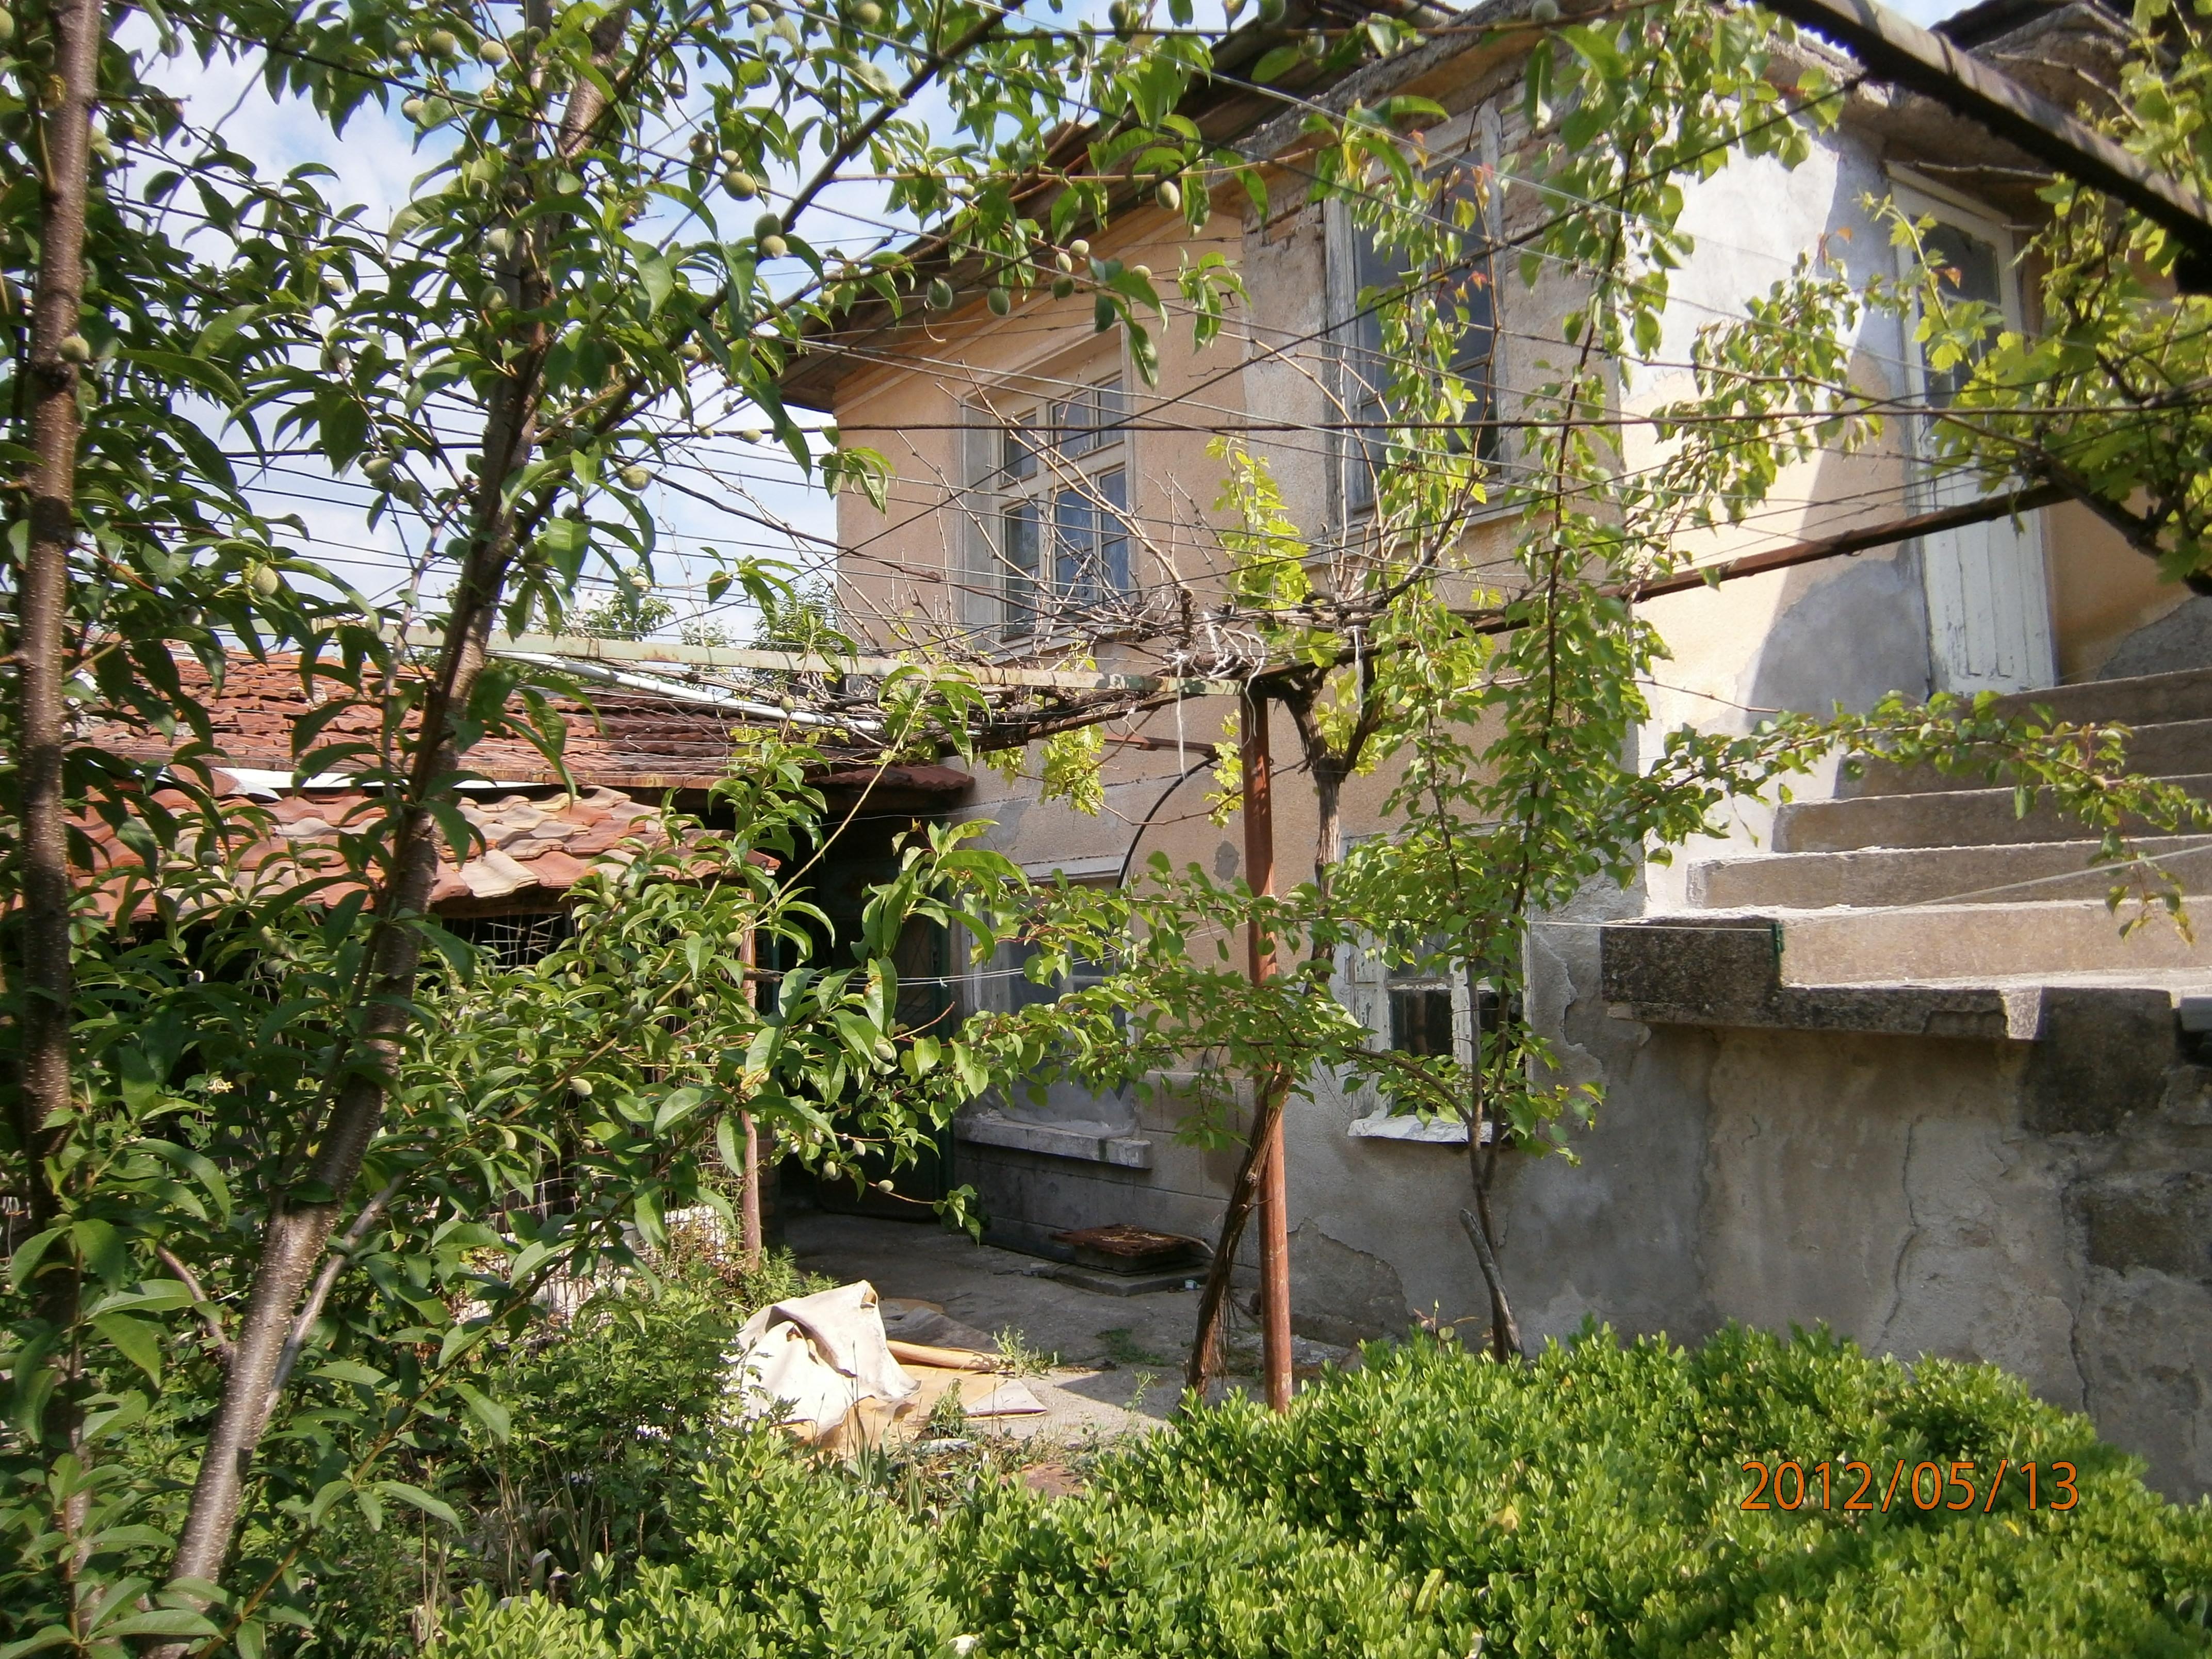 Immobilier dimitrievo stara zagora bulgarie maison rurale vendre pas ch - Maison a vendre pas cher ...